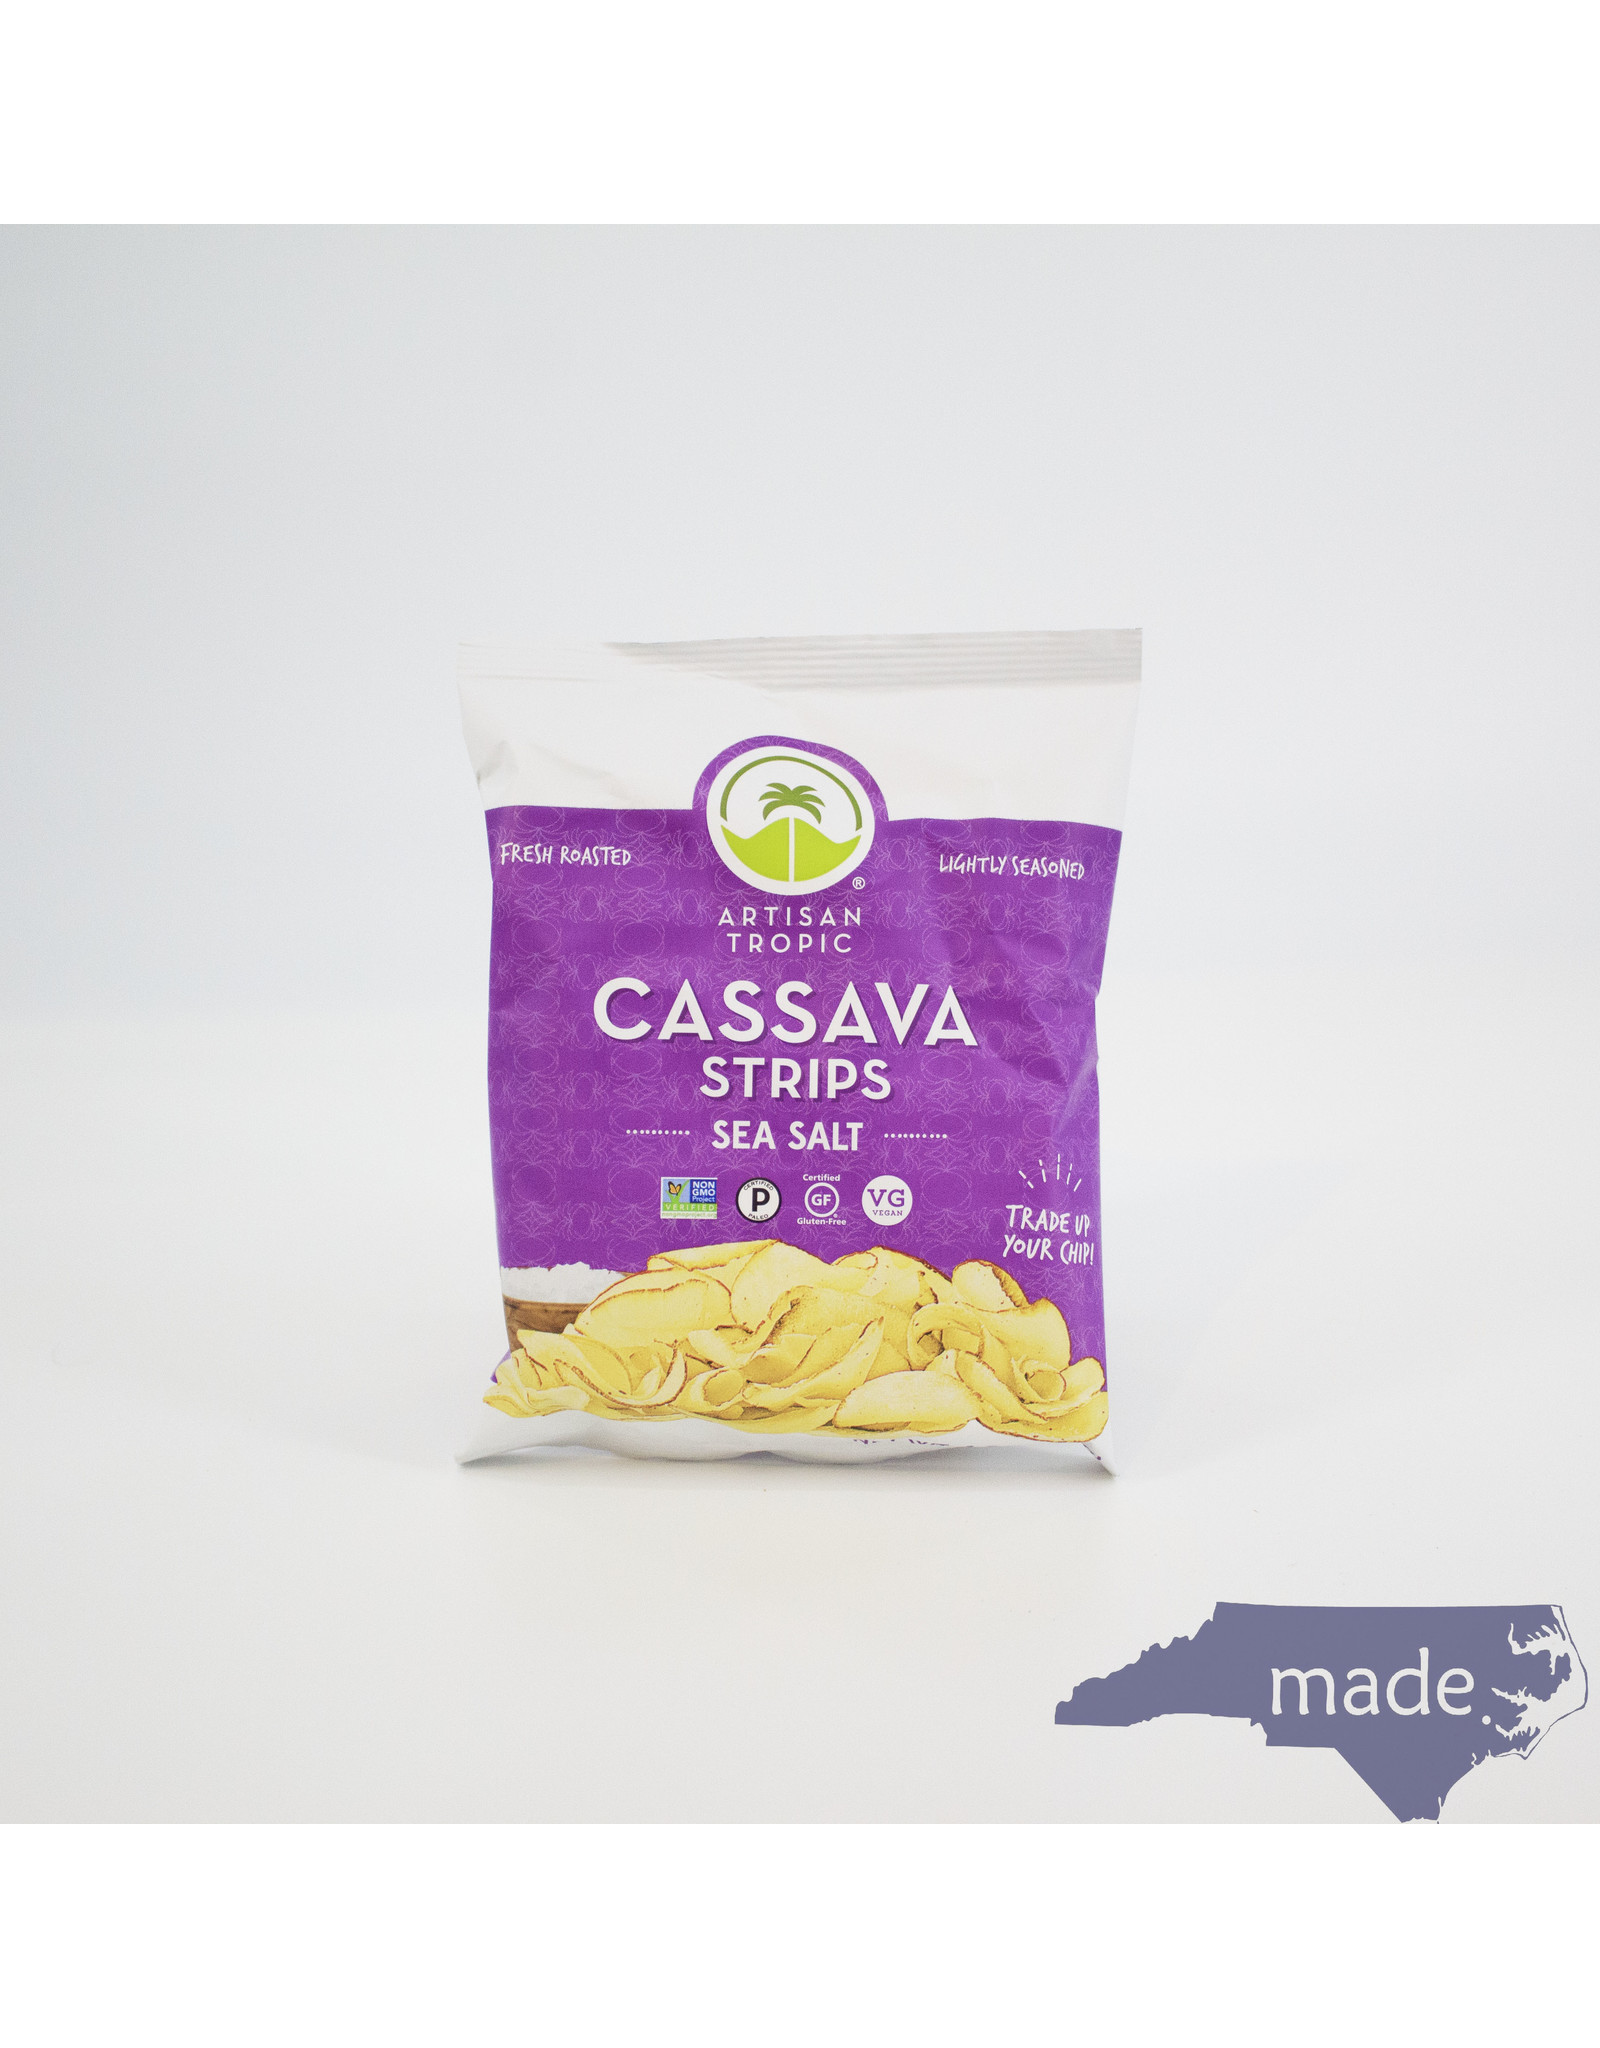 Artisan Tropic Cassava Sea Salt 1.2 oz. - Artisan Tropic